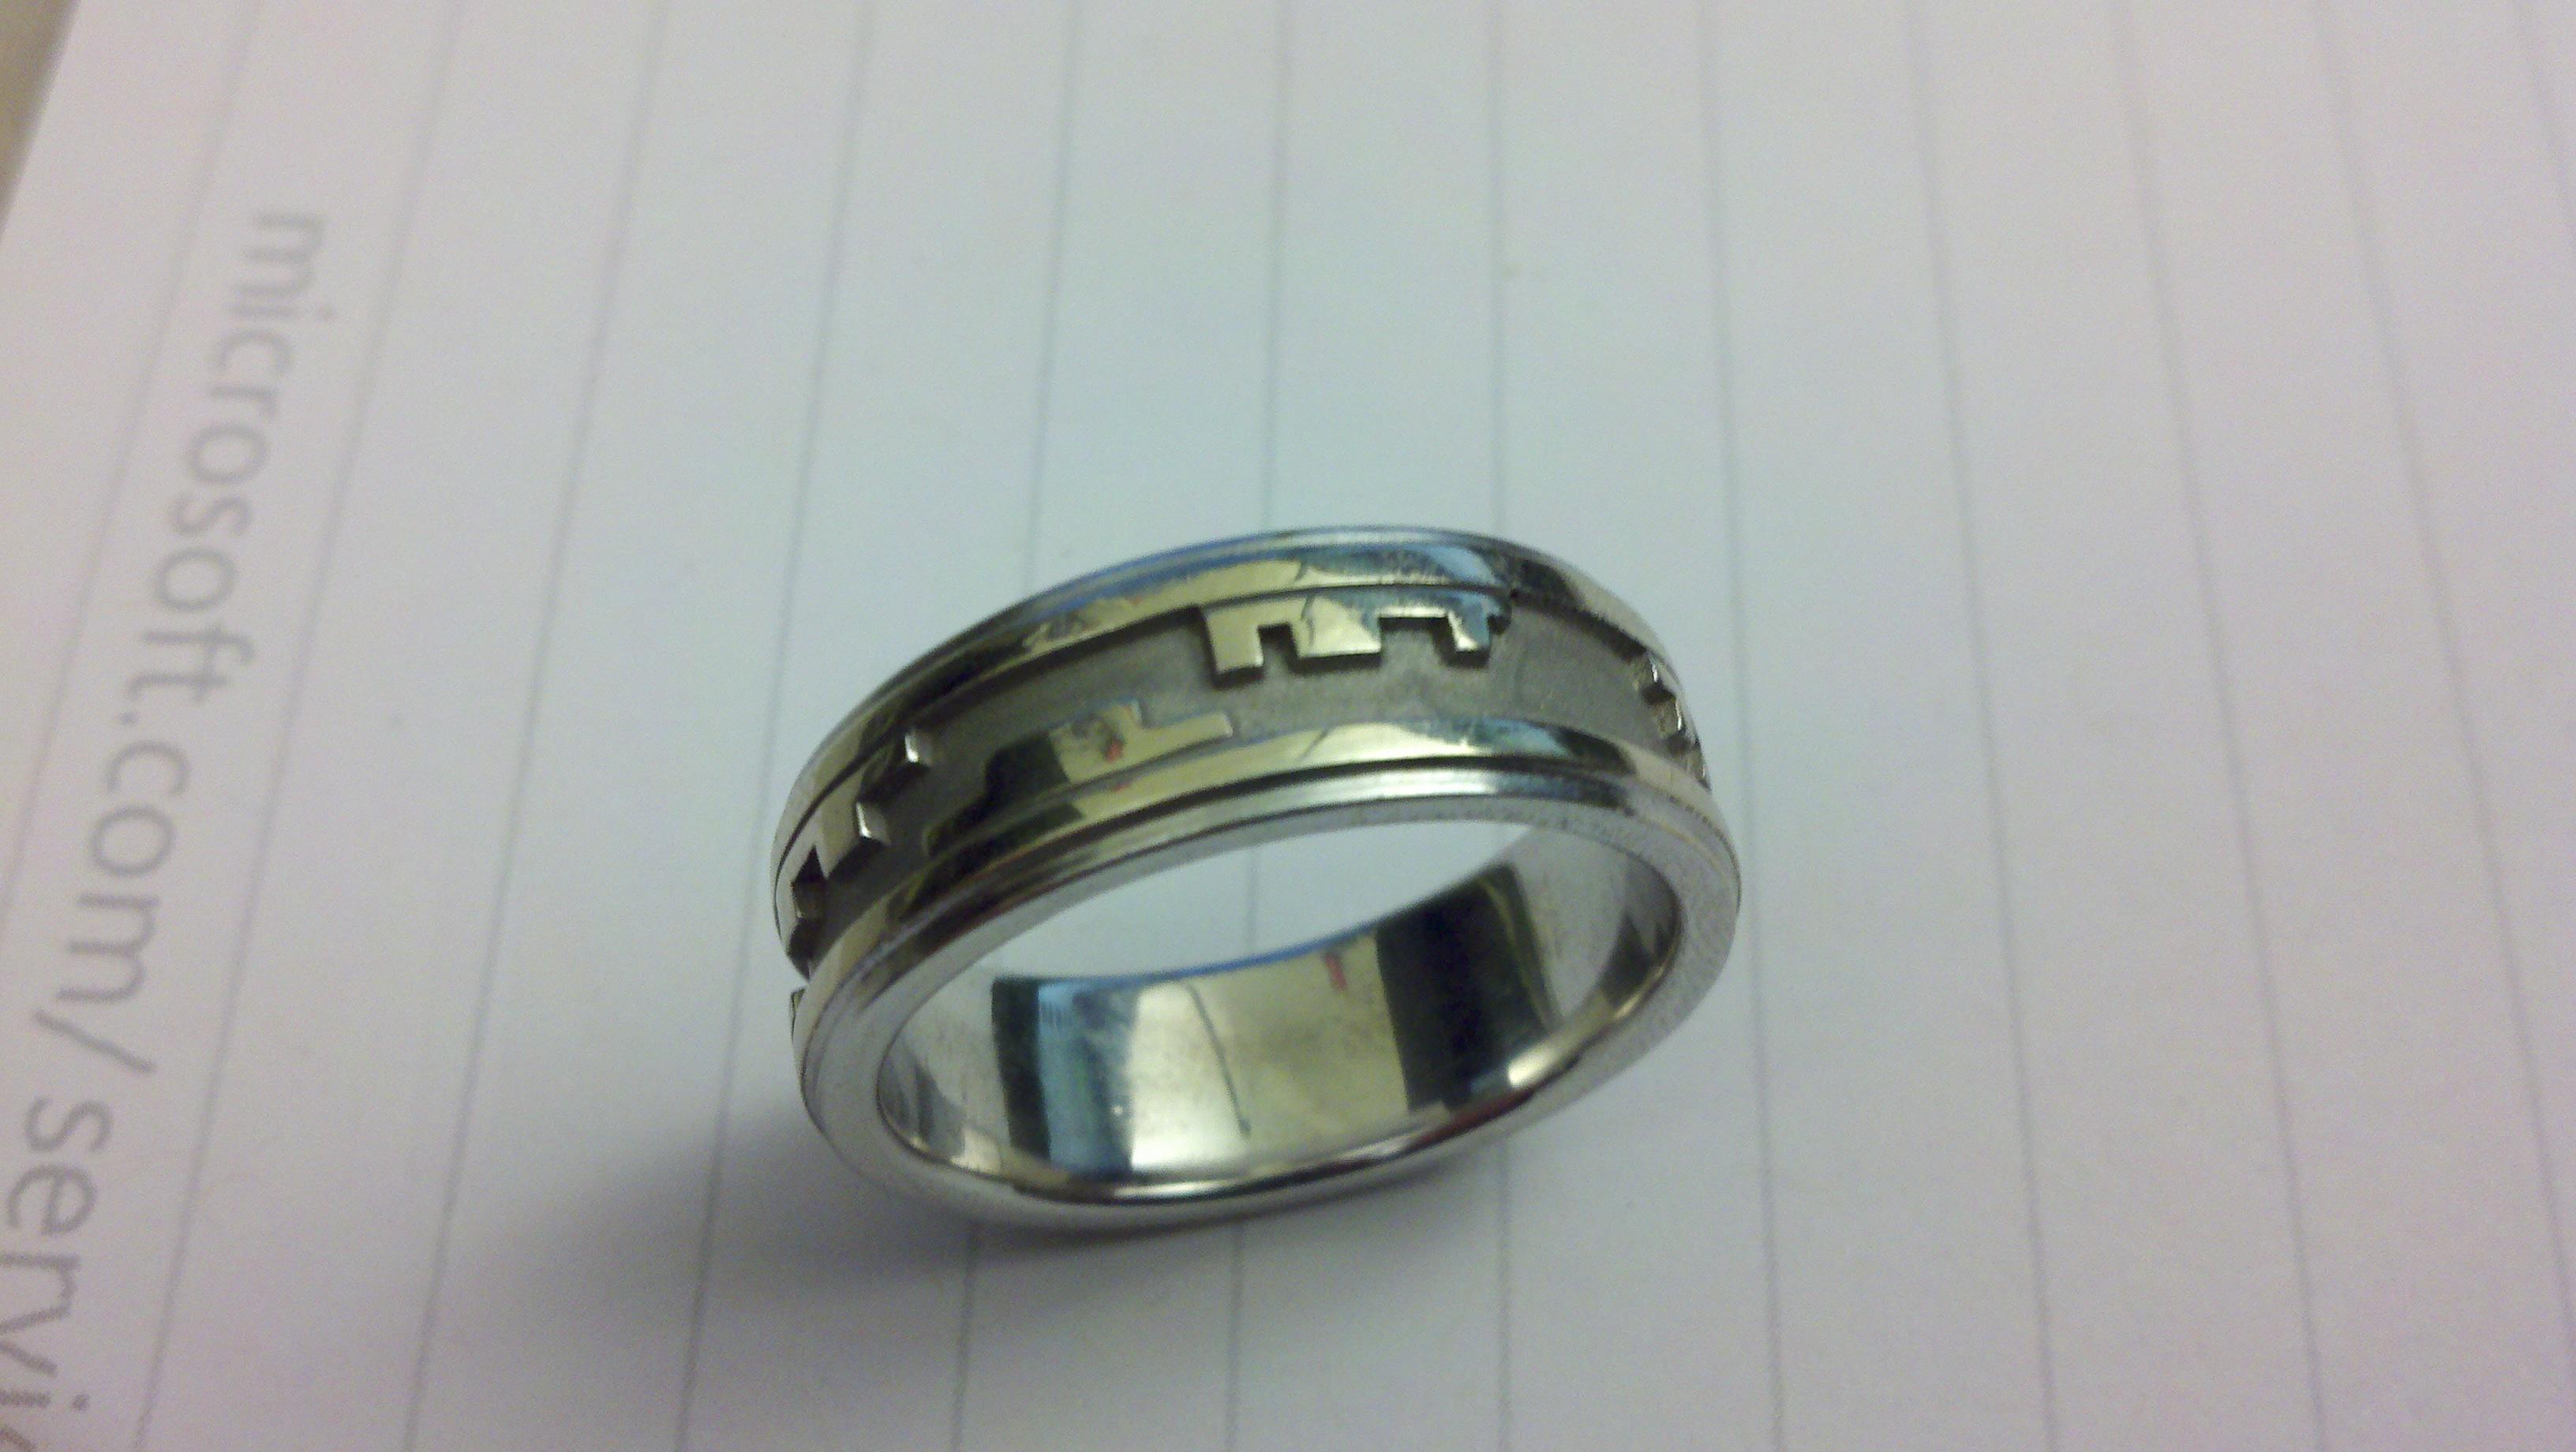 Digital fensive Blog Archive My high tech geek wedding ring